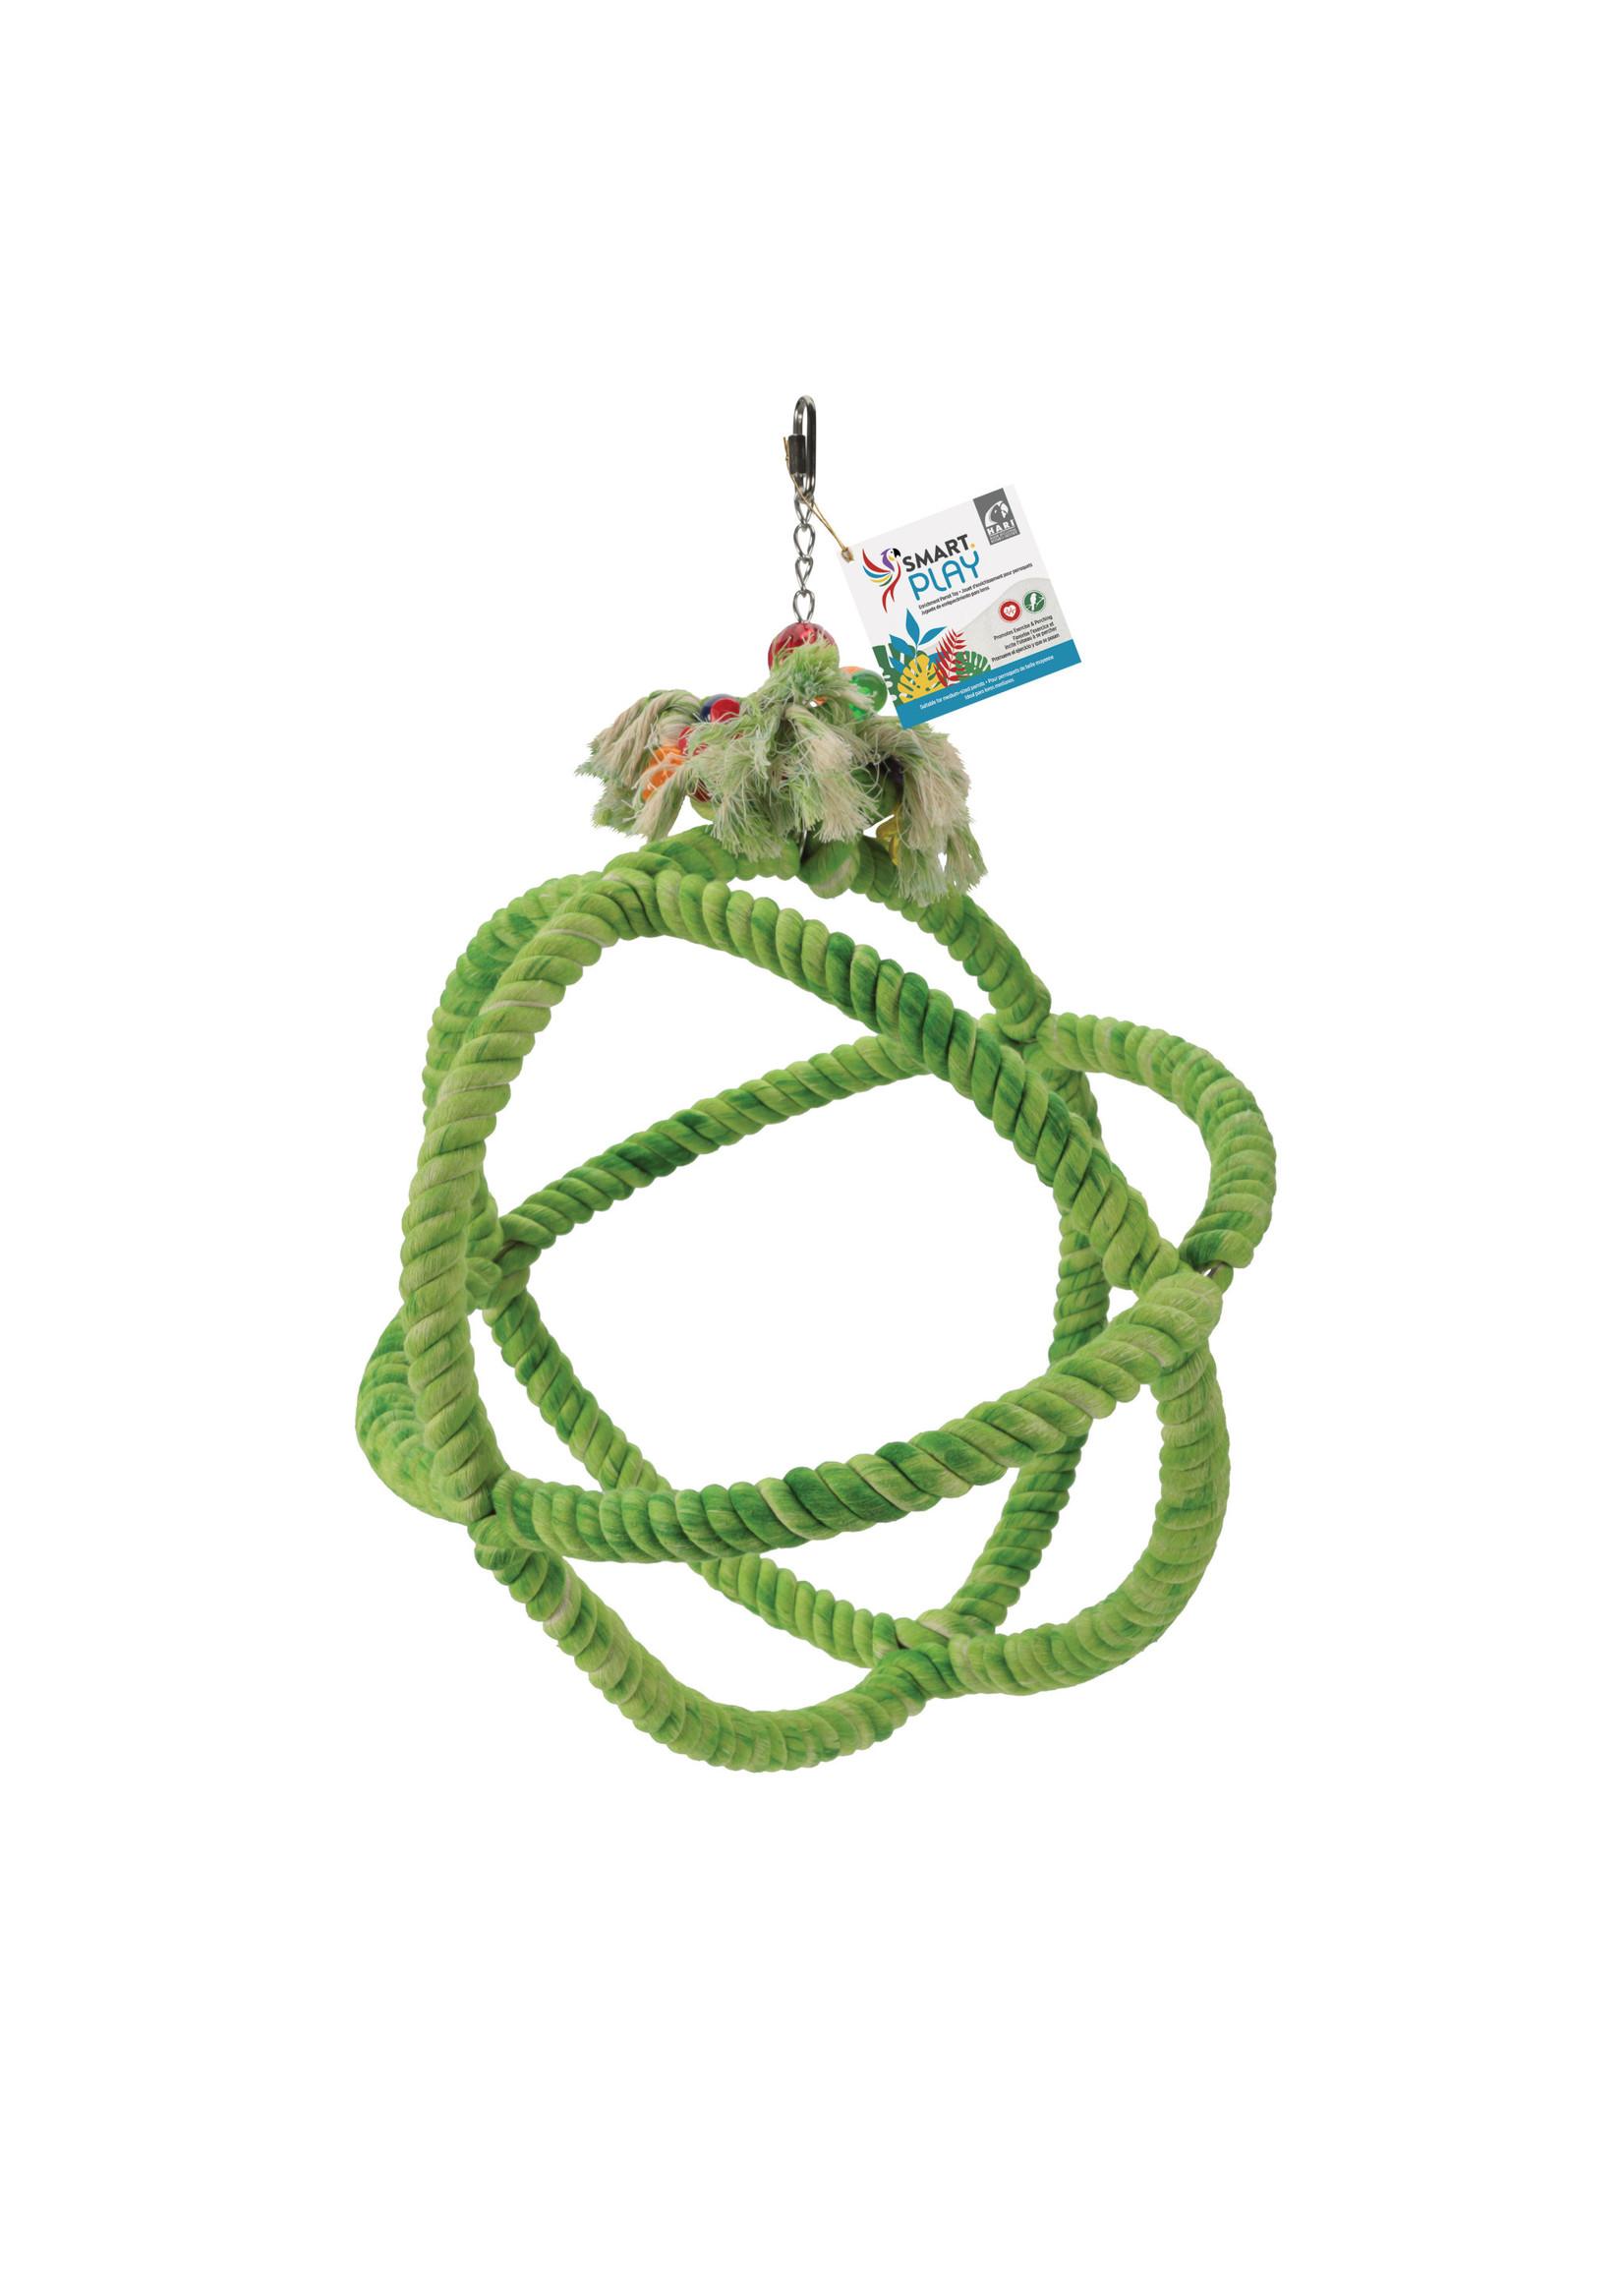 Hagen Hagen HARI SMART.PLAY Enrichment Parrot Toy - Roper Orbiter Perch n Swing - Large